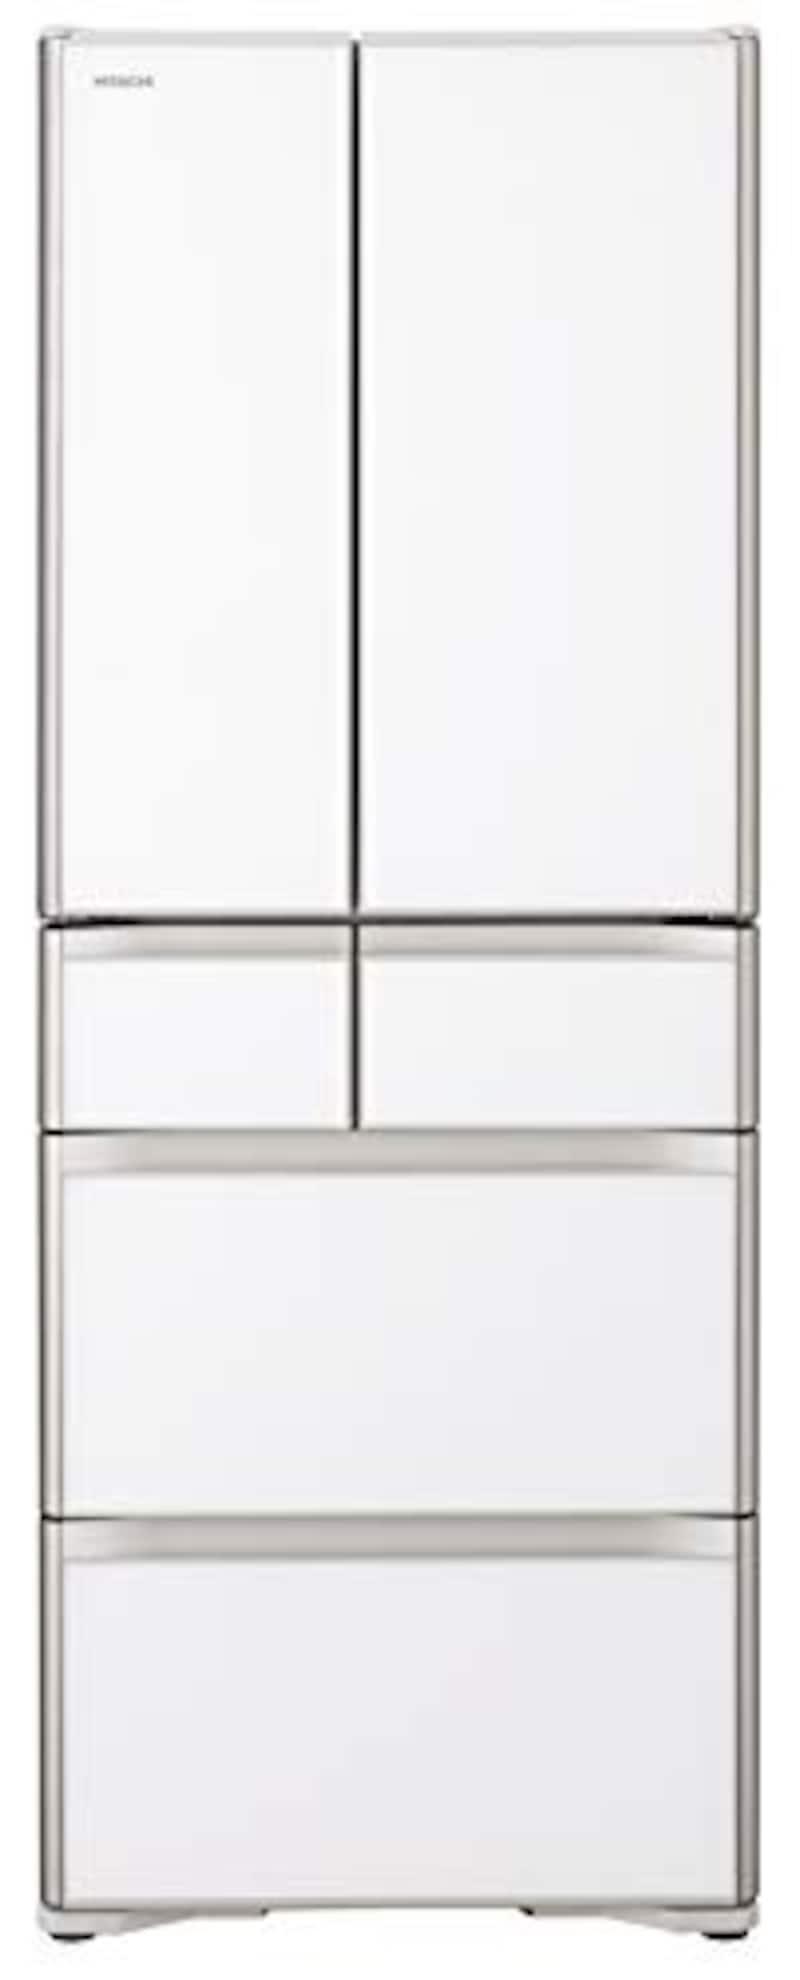 HITACHI(日立),冷蔵庫,R-X51N